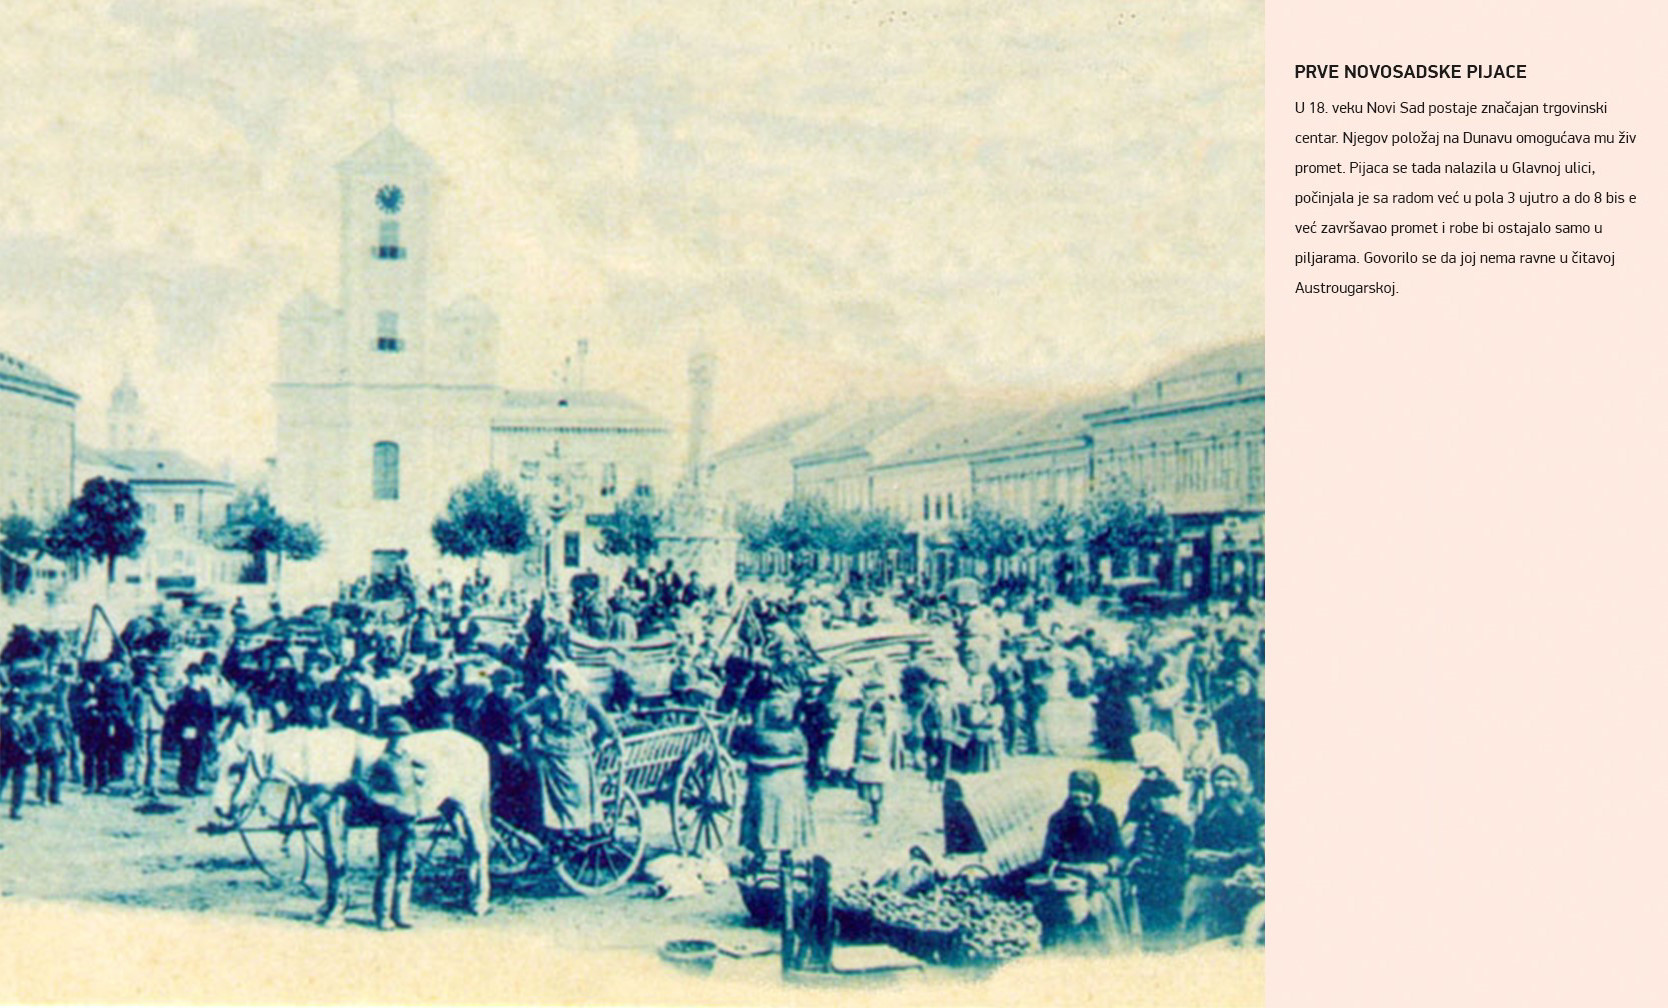 Prve novosadske pijace